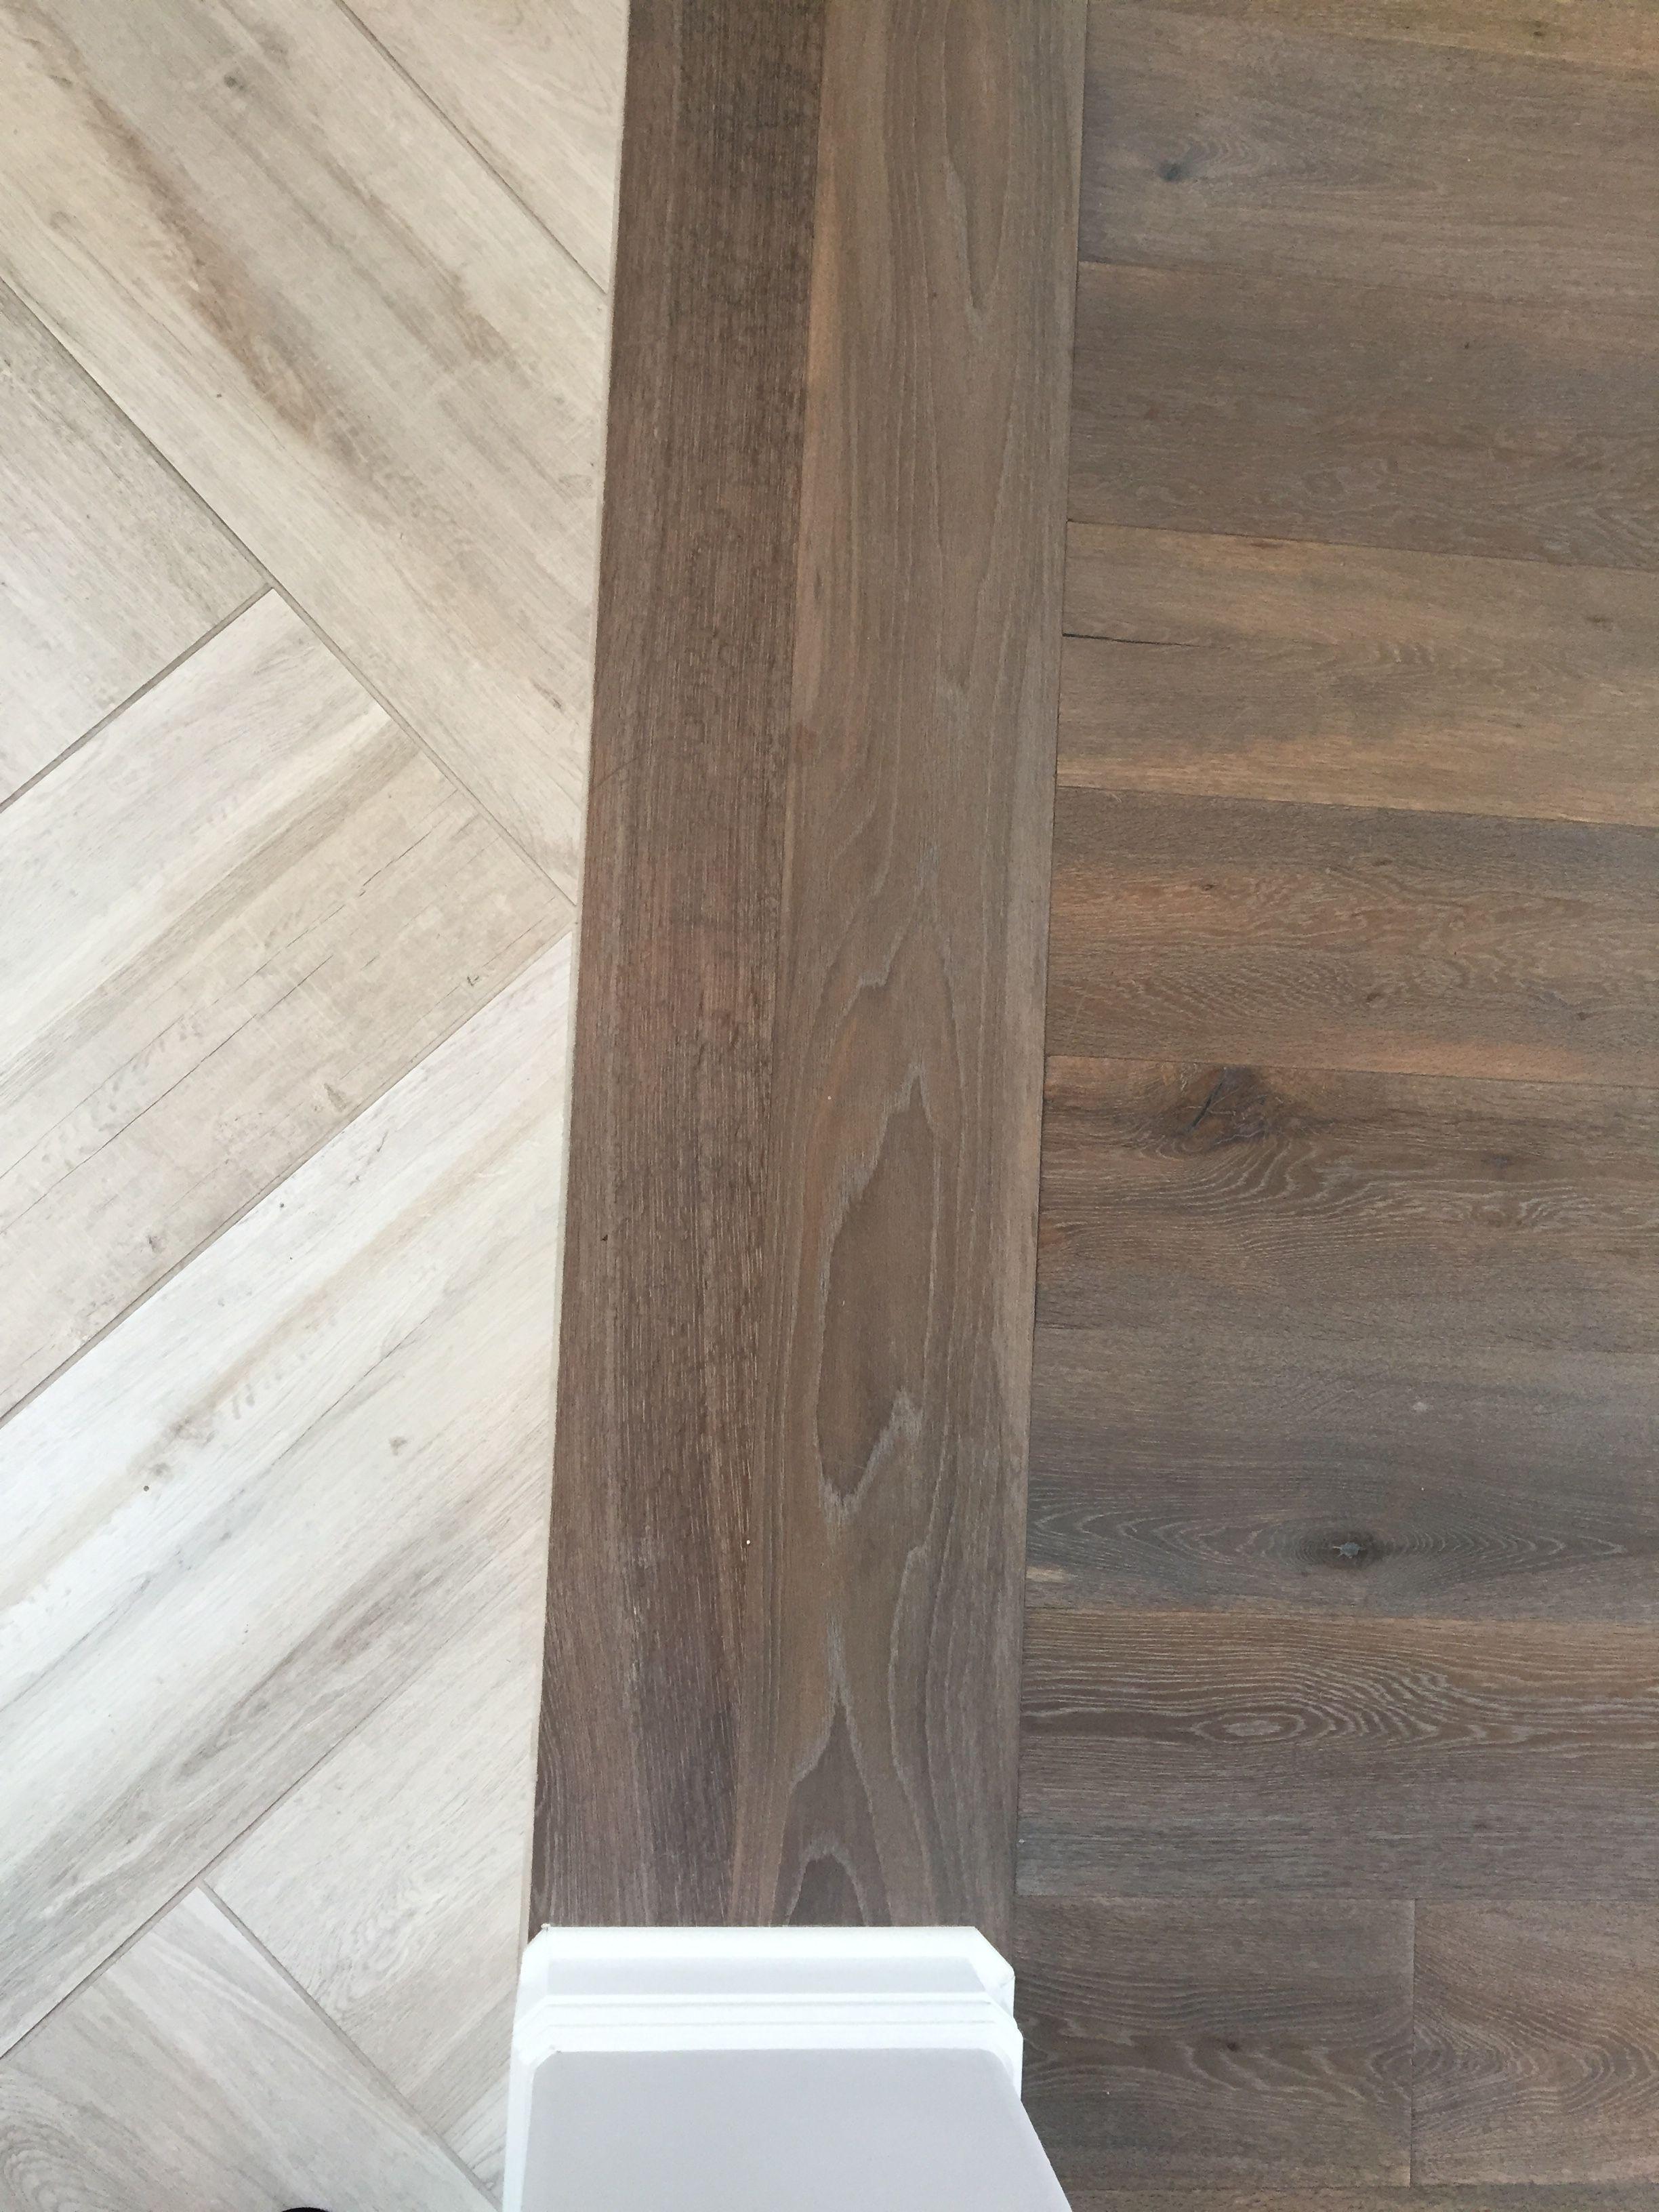 hardwood flooring san jose yelp of tile flooring san antonio beautiful richard s floor covering 21 s throughout tile flooring san antonio unique types floor tiles bathroom shower wall tile bosco cenere faux